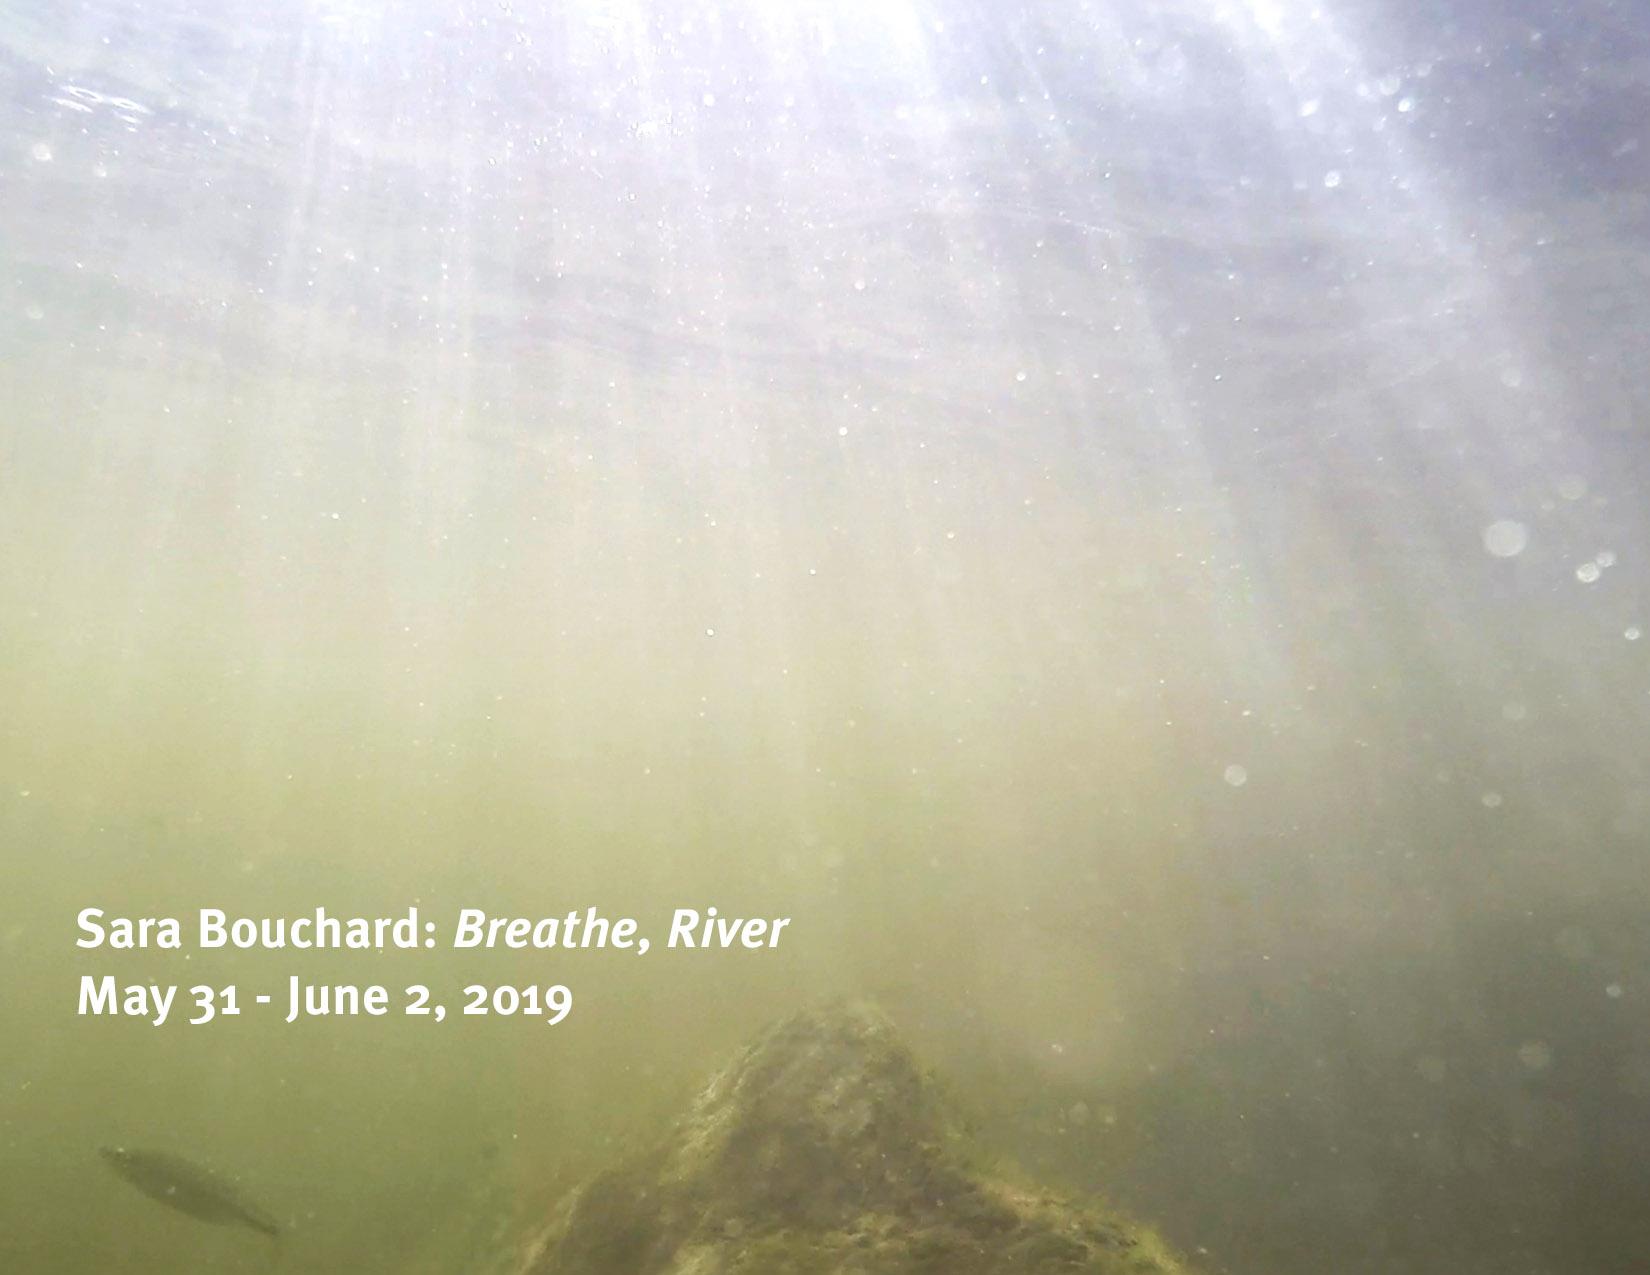 03_Breathe-River-postcard-recto.jpg